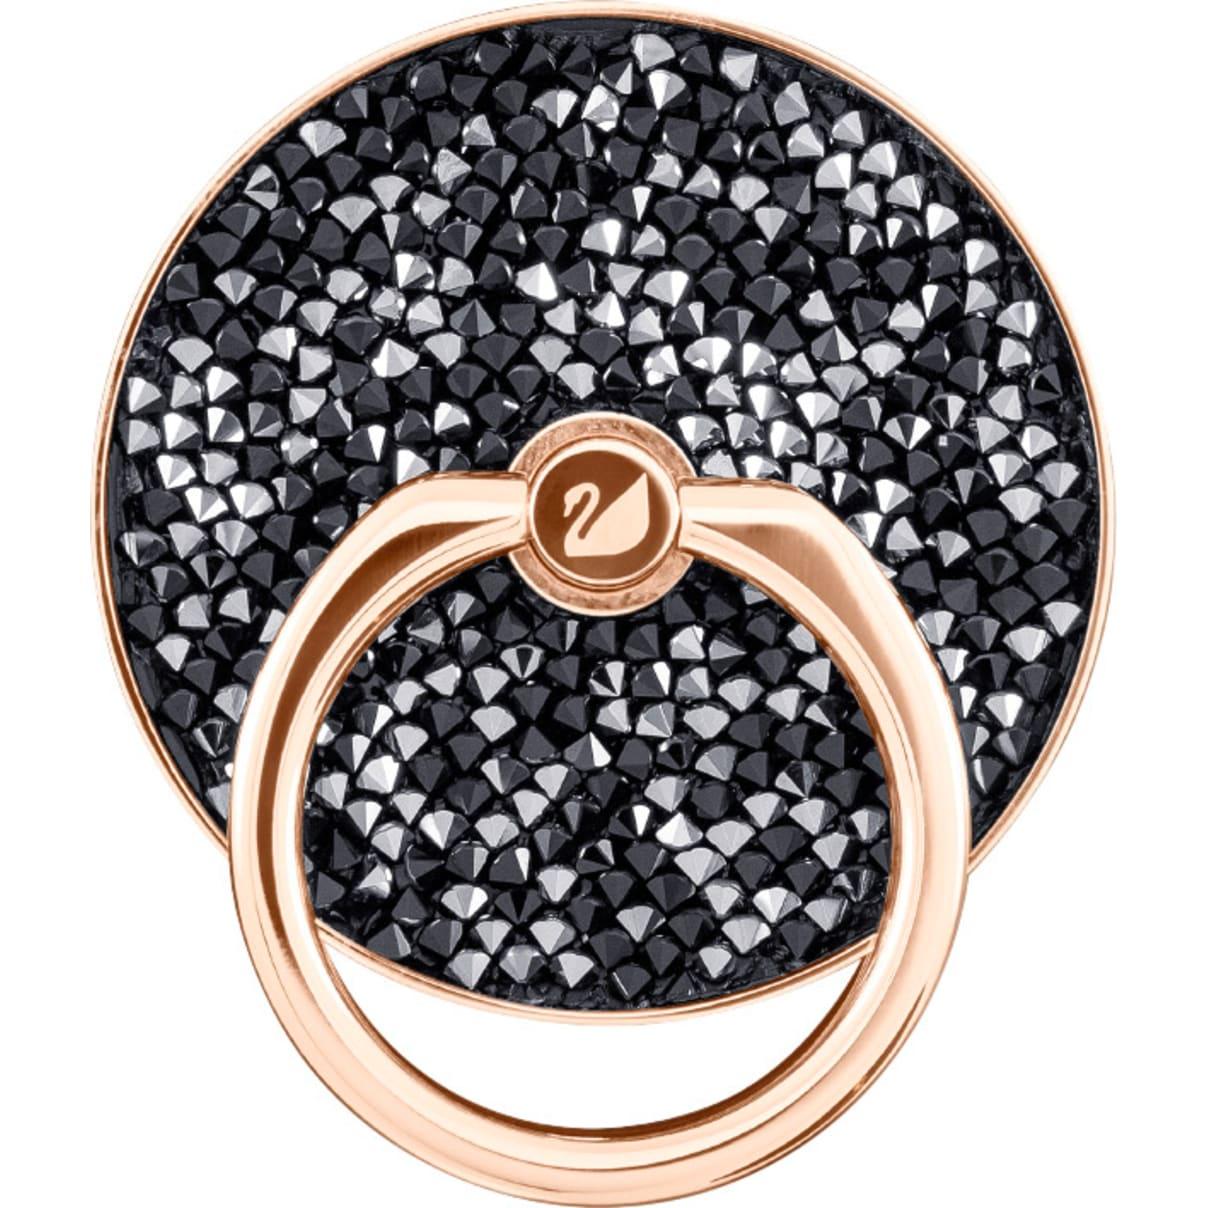 Swarovski Glam Rock Ring Sticker, Black, Mixed plating